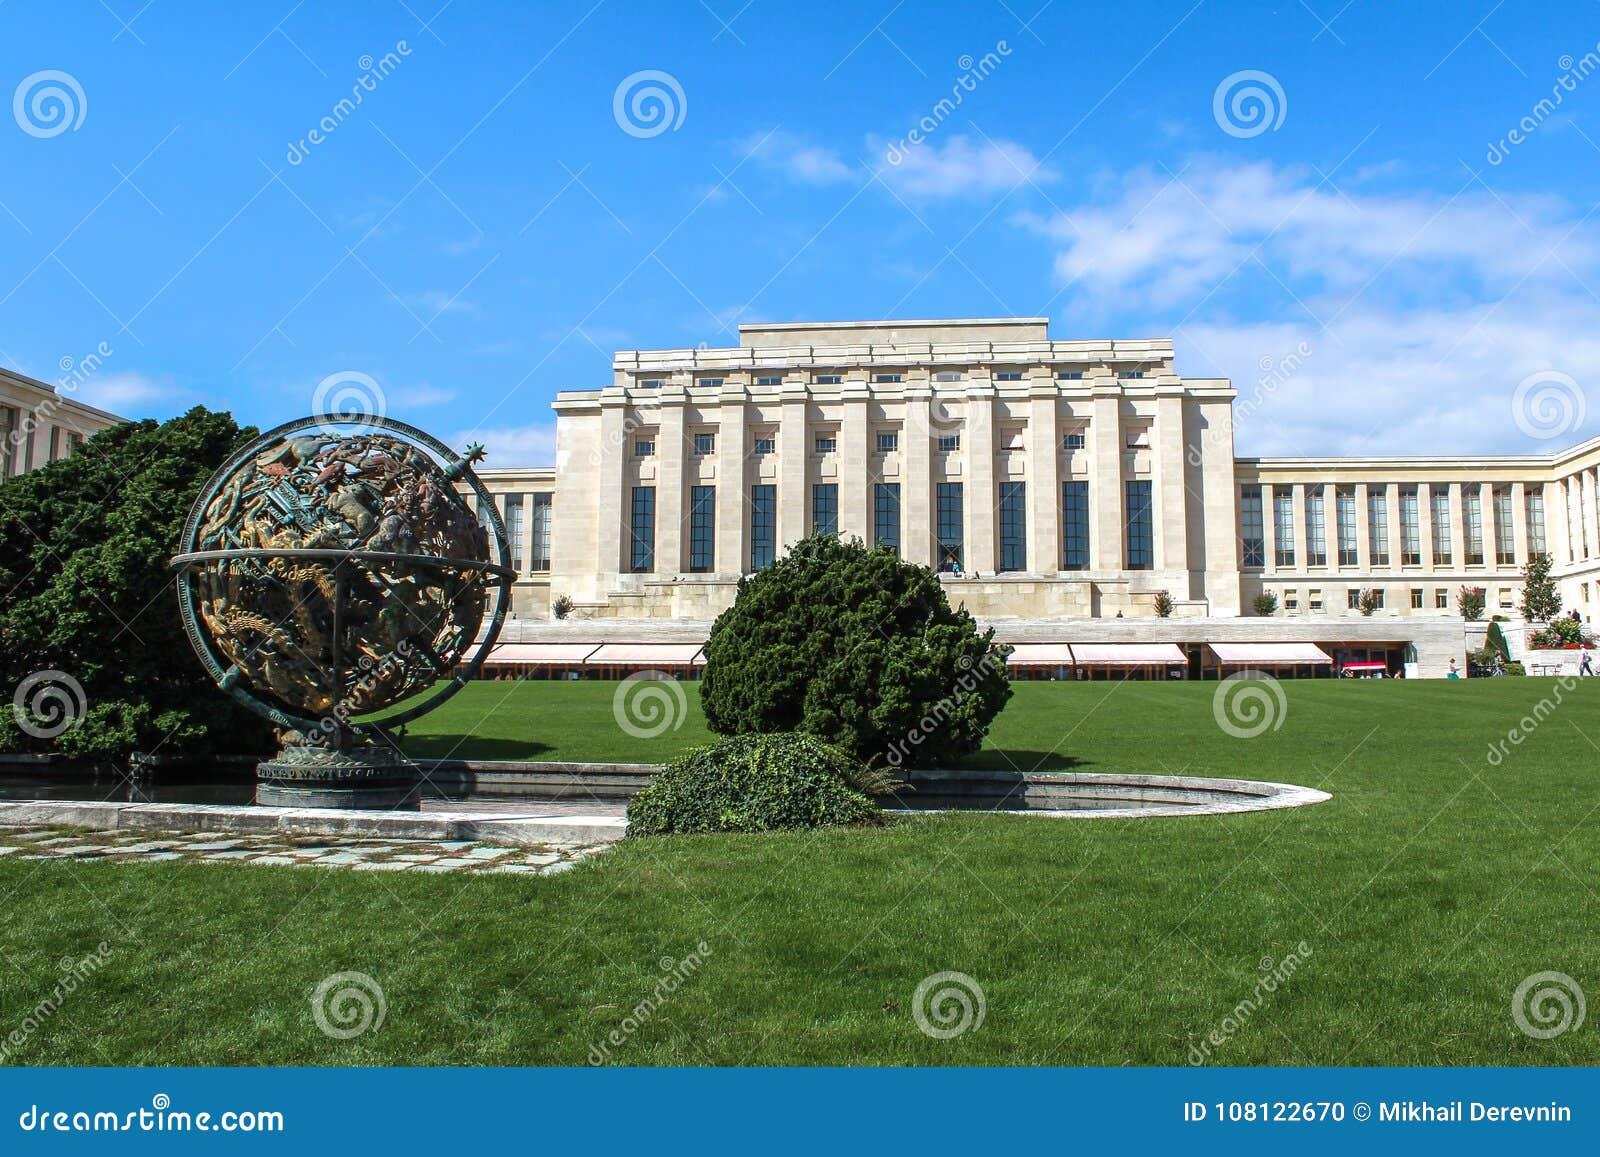 United nations organization. Geneva. Switzerland.